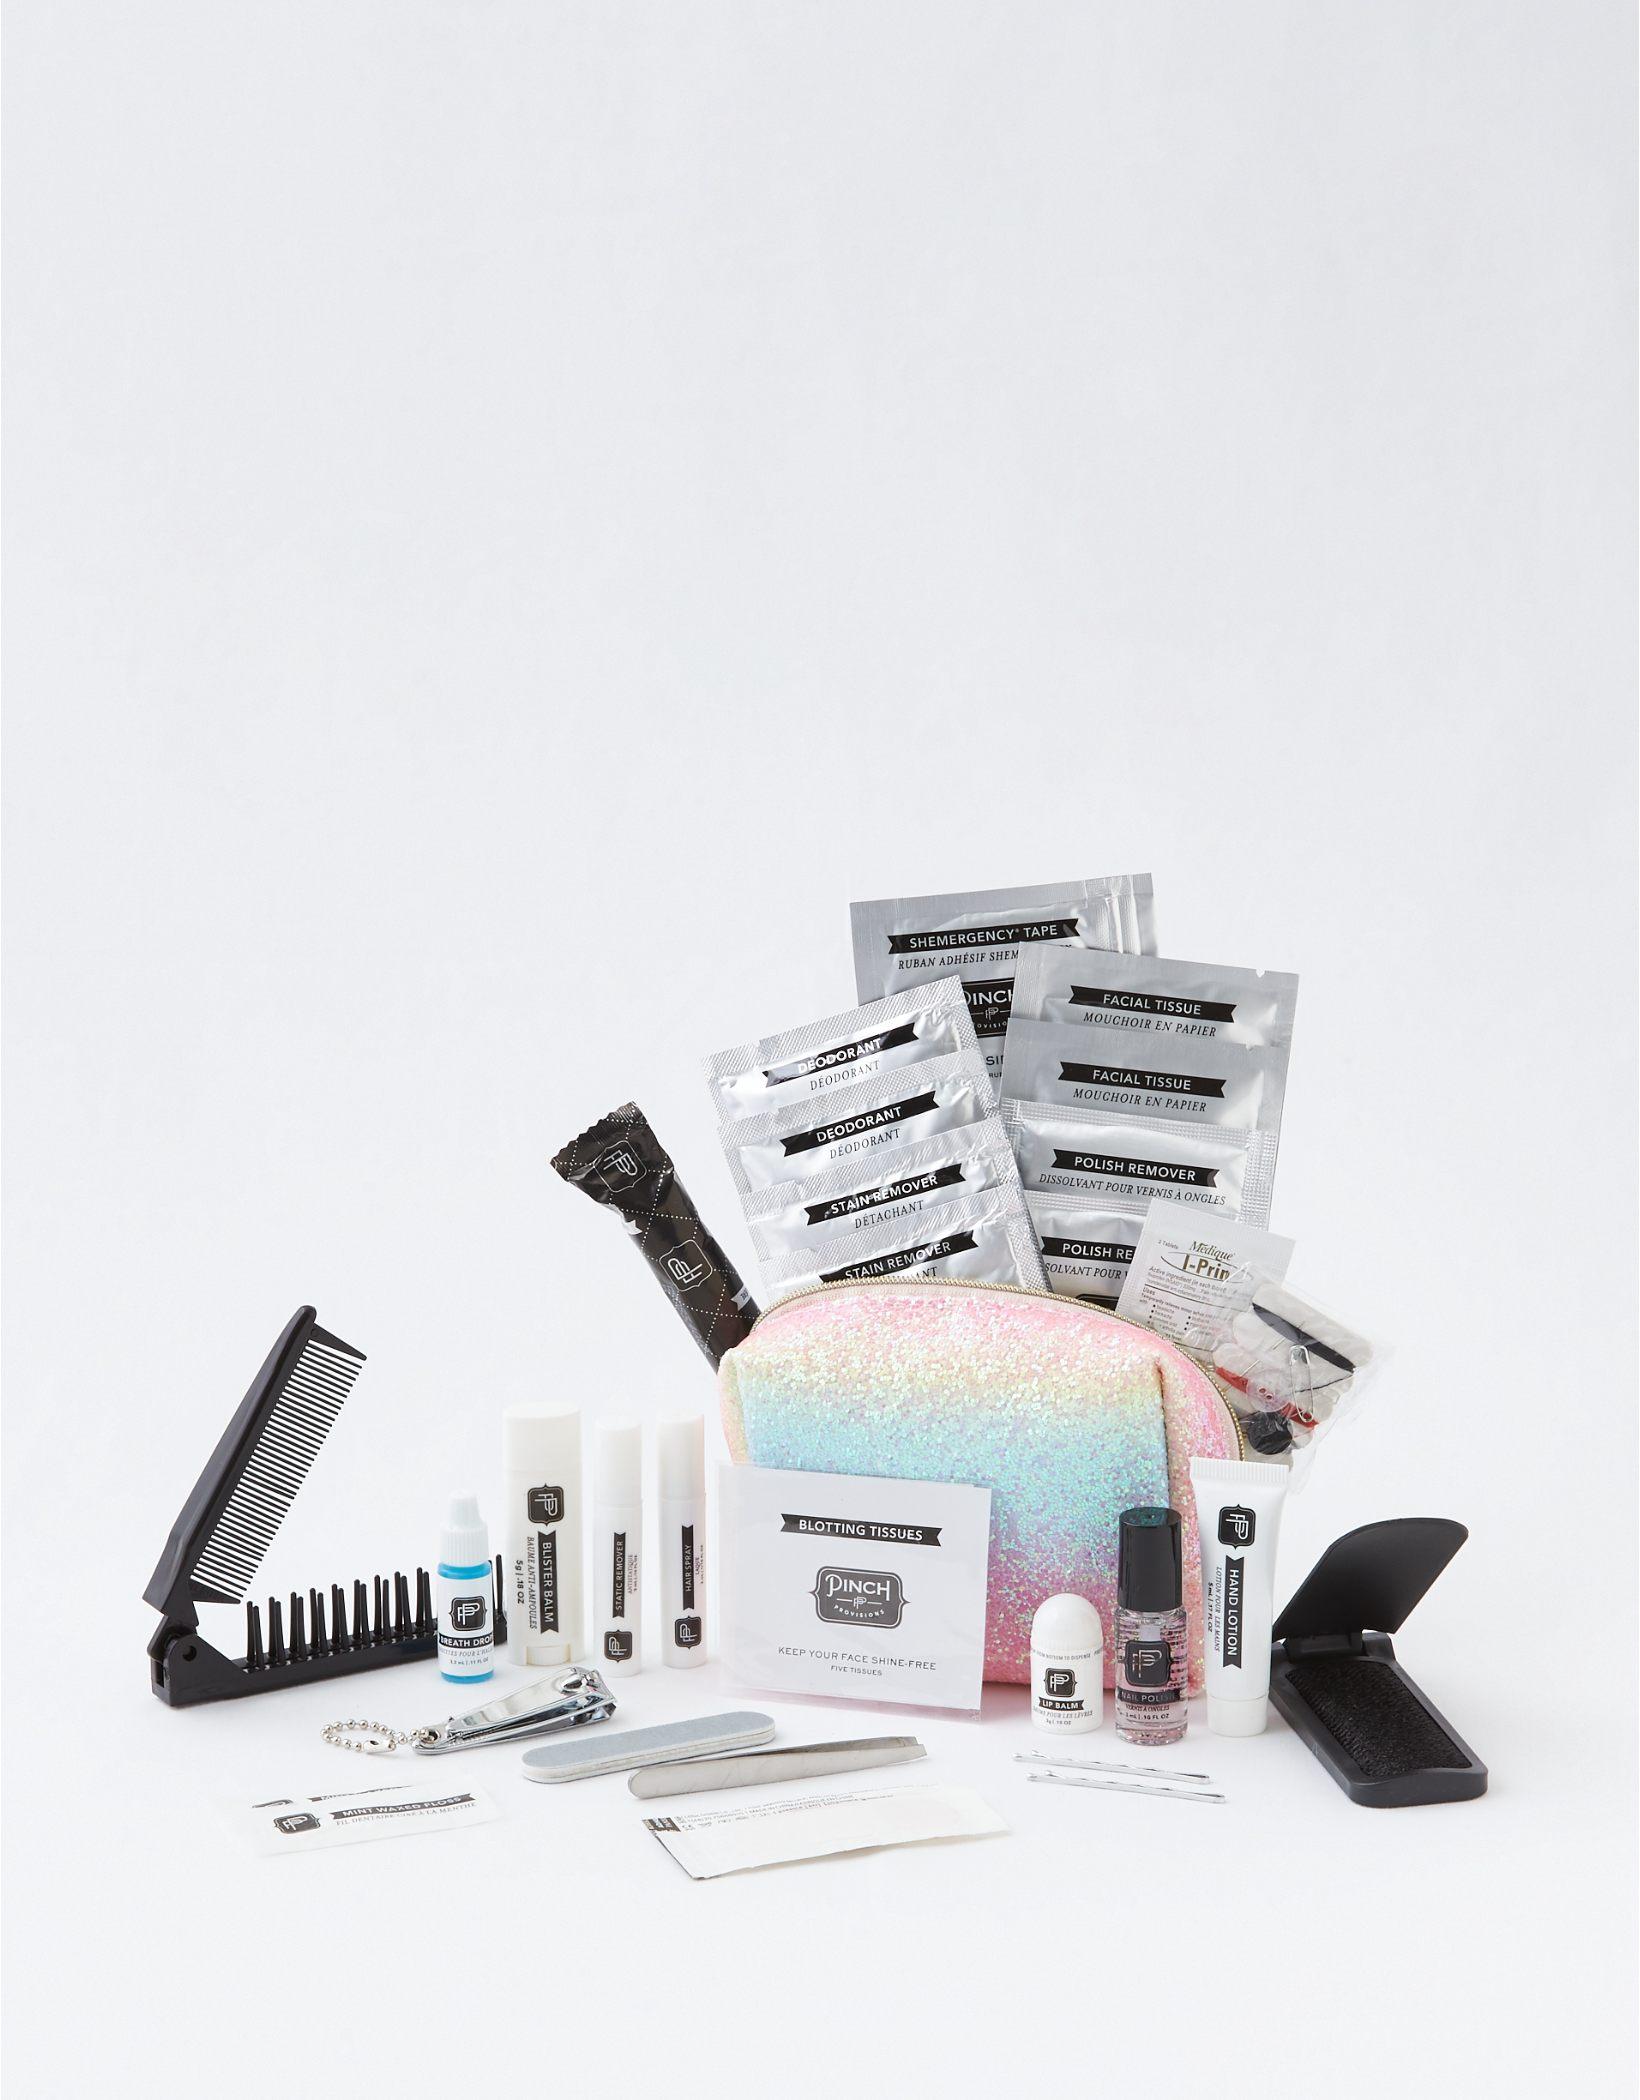 Pinch Rainbow Glitter Shemergency Kit